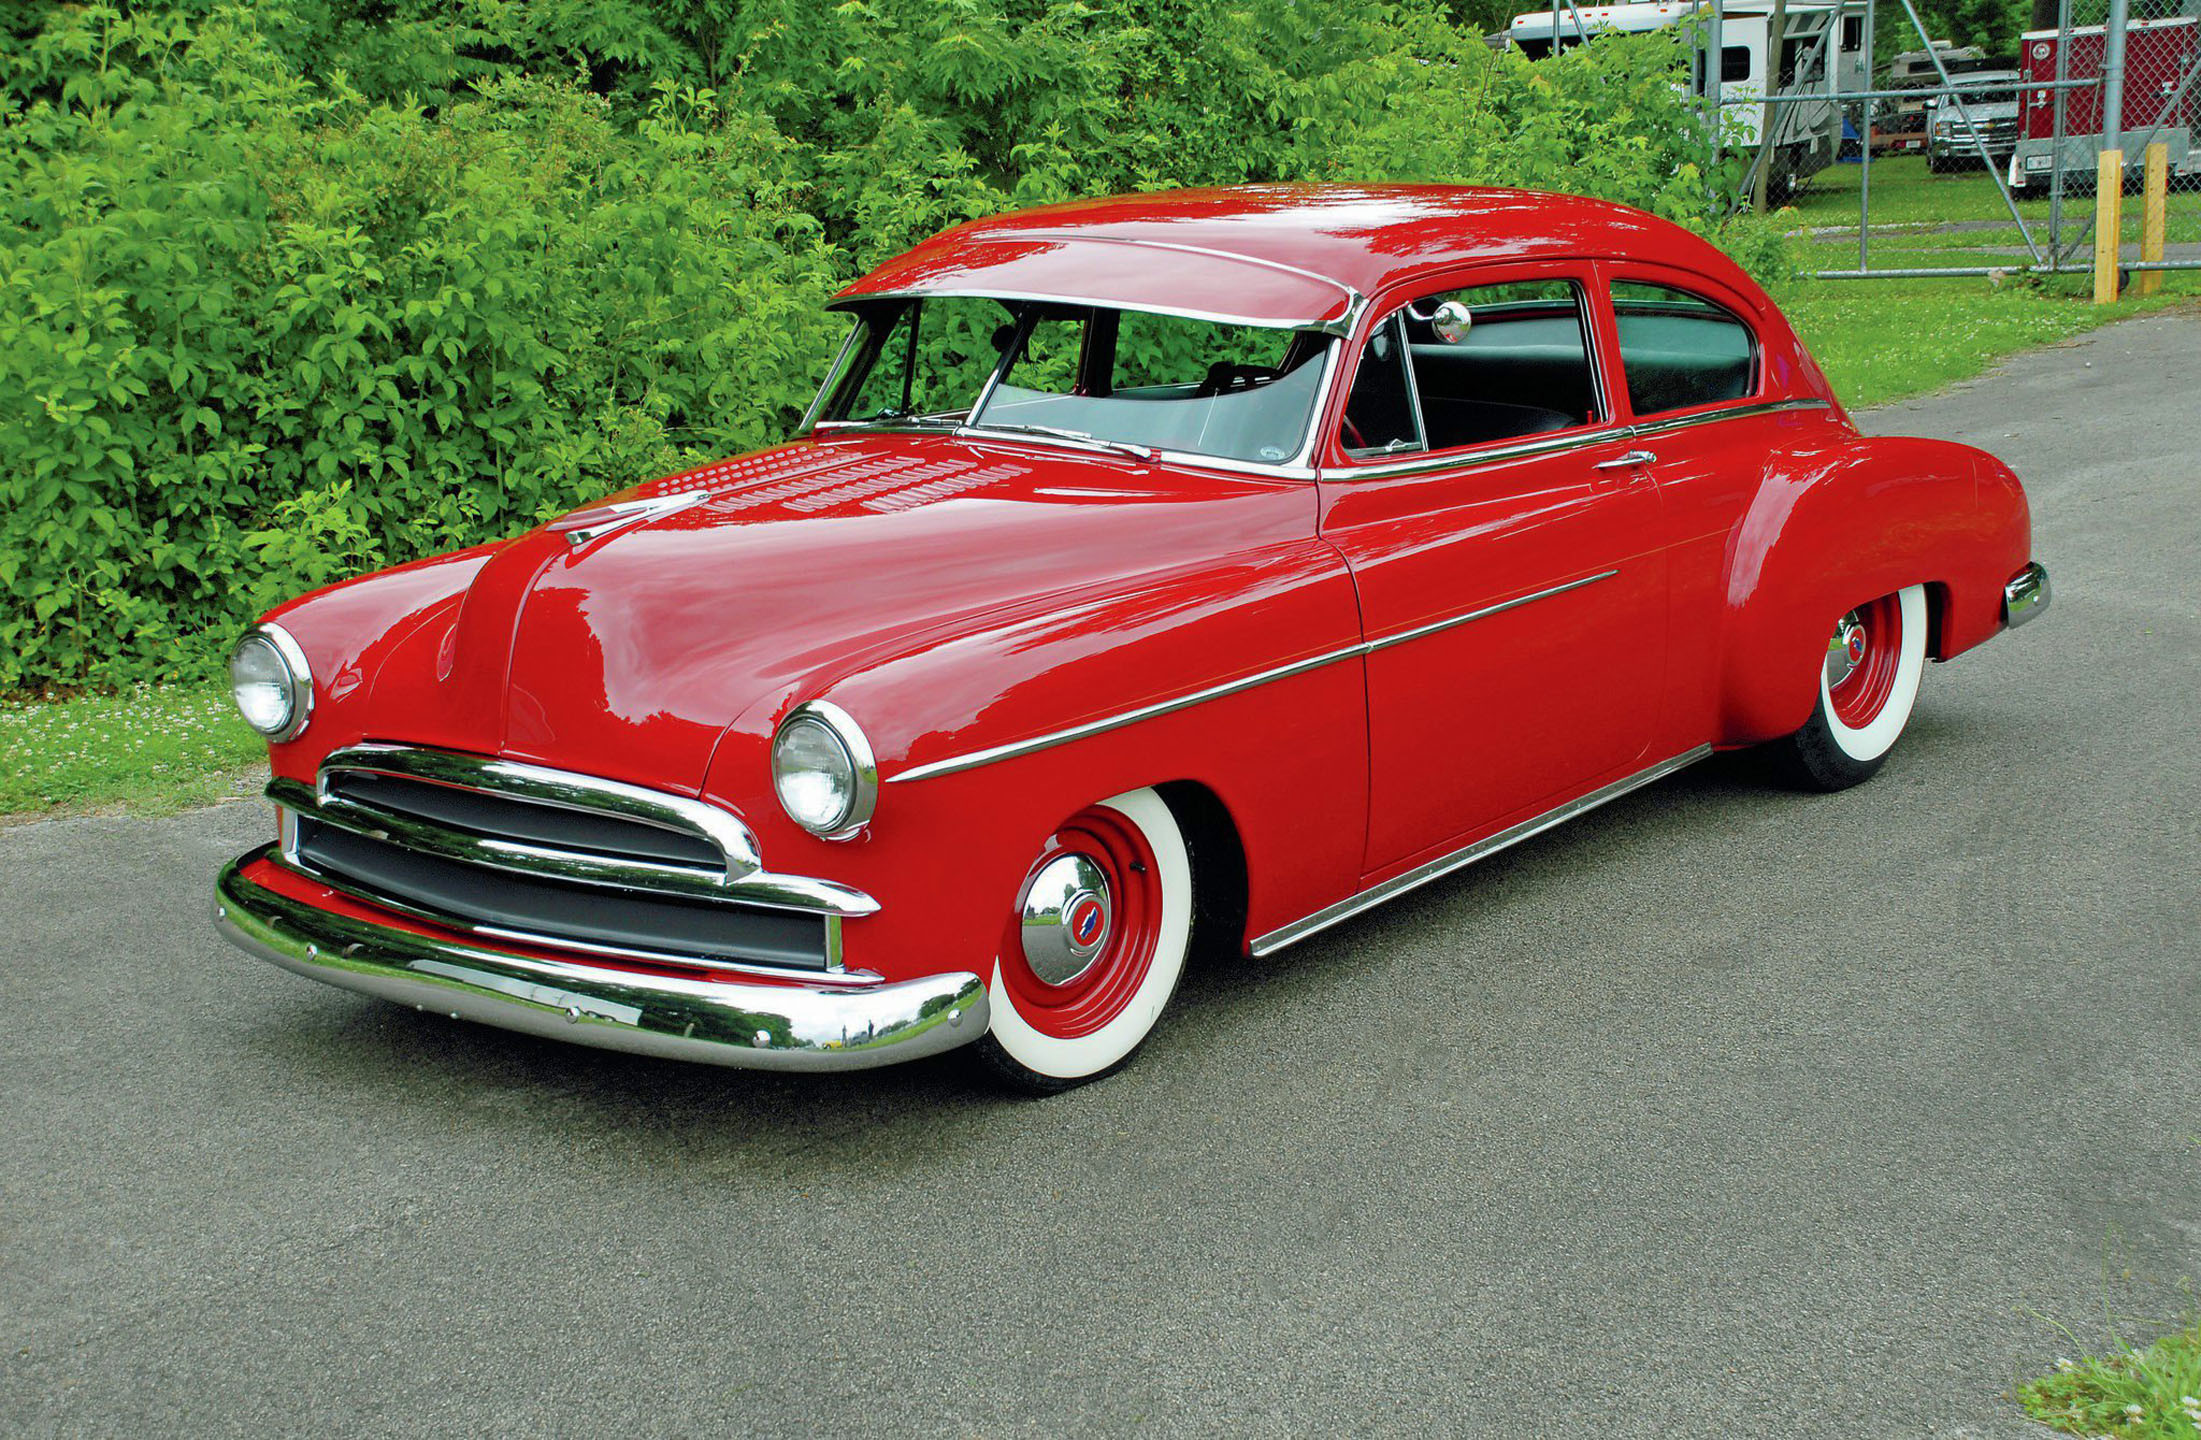 Beautiful Red 1949 Chevrolet Fleetline